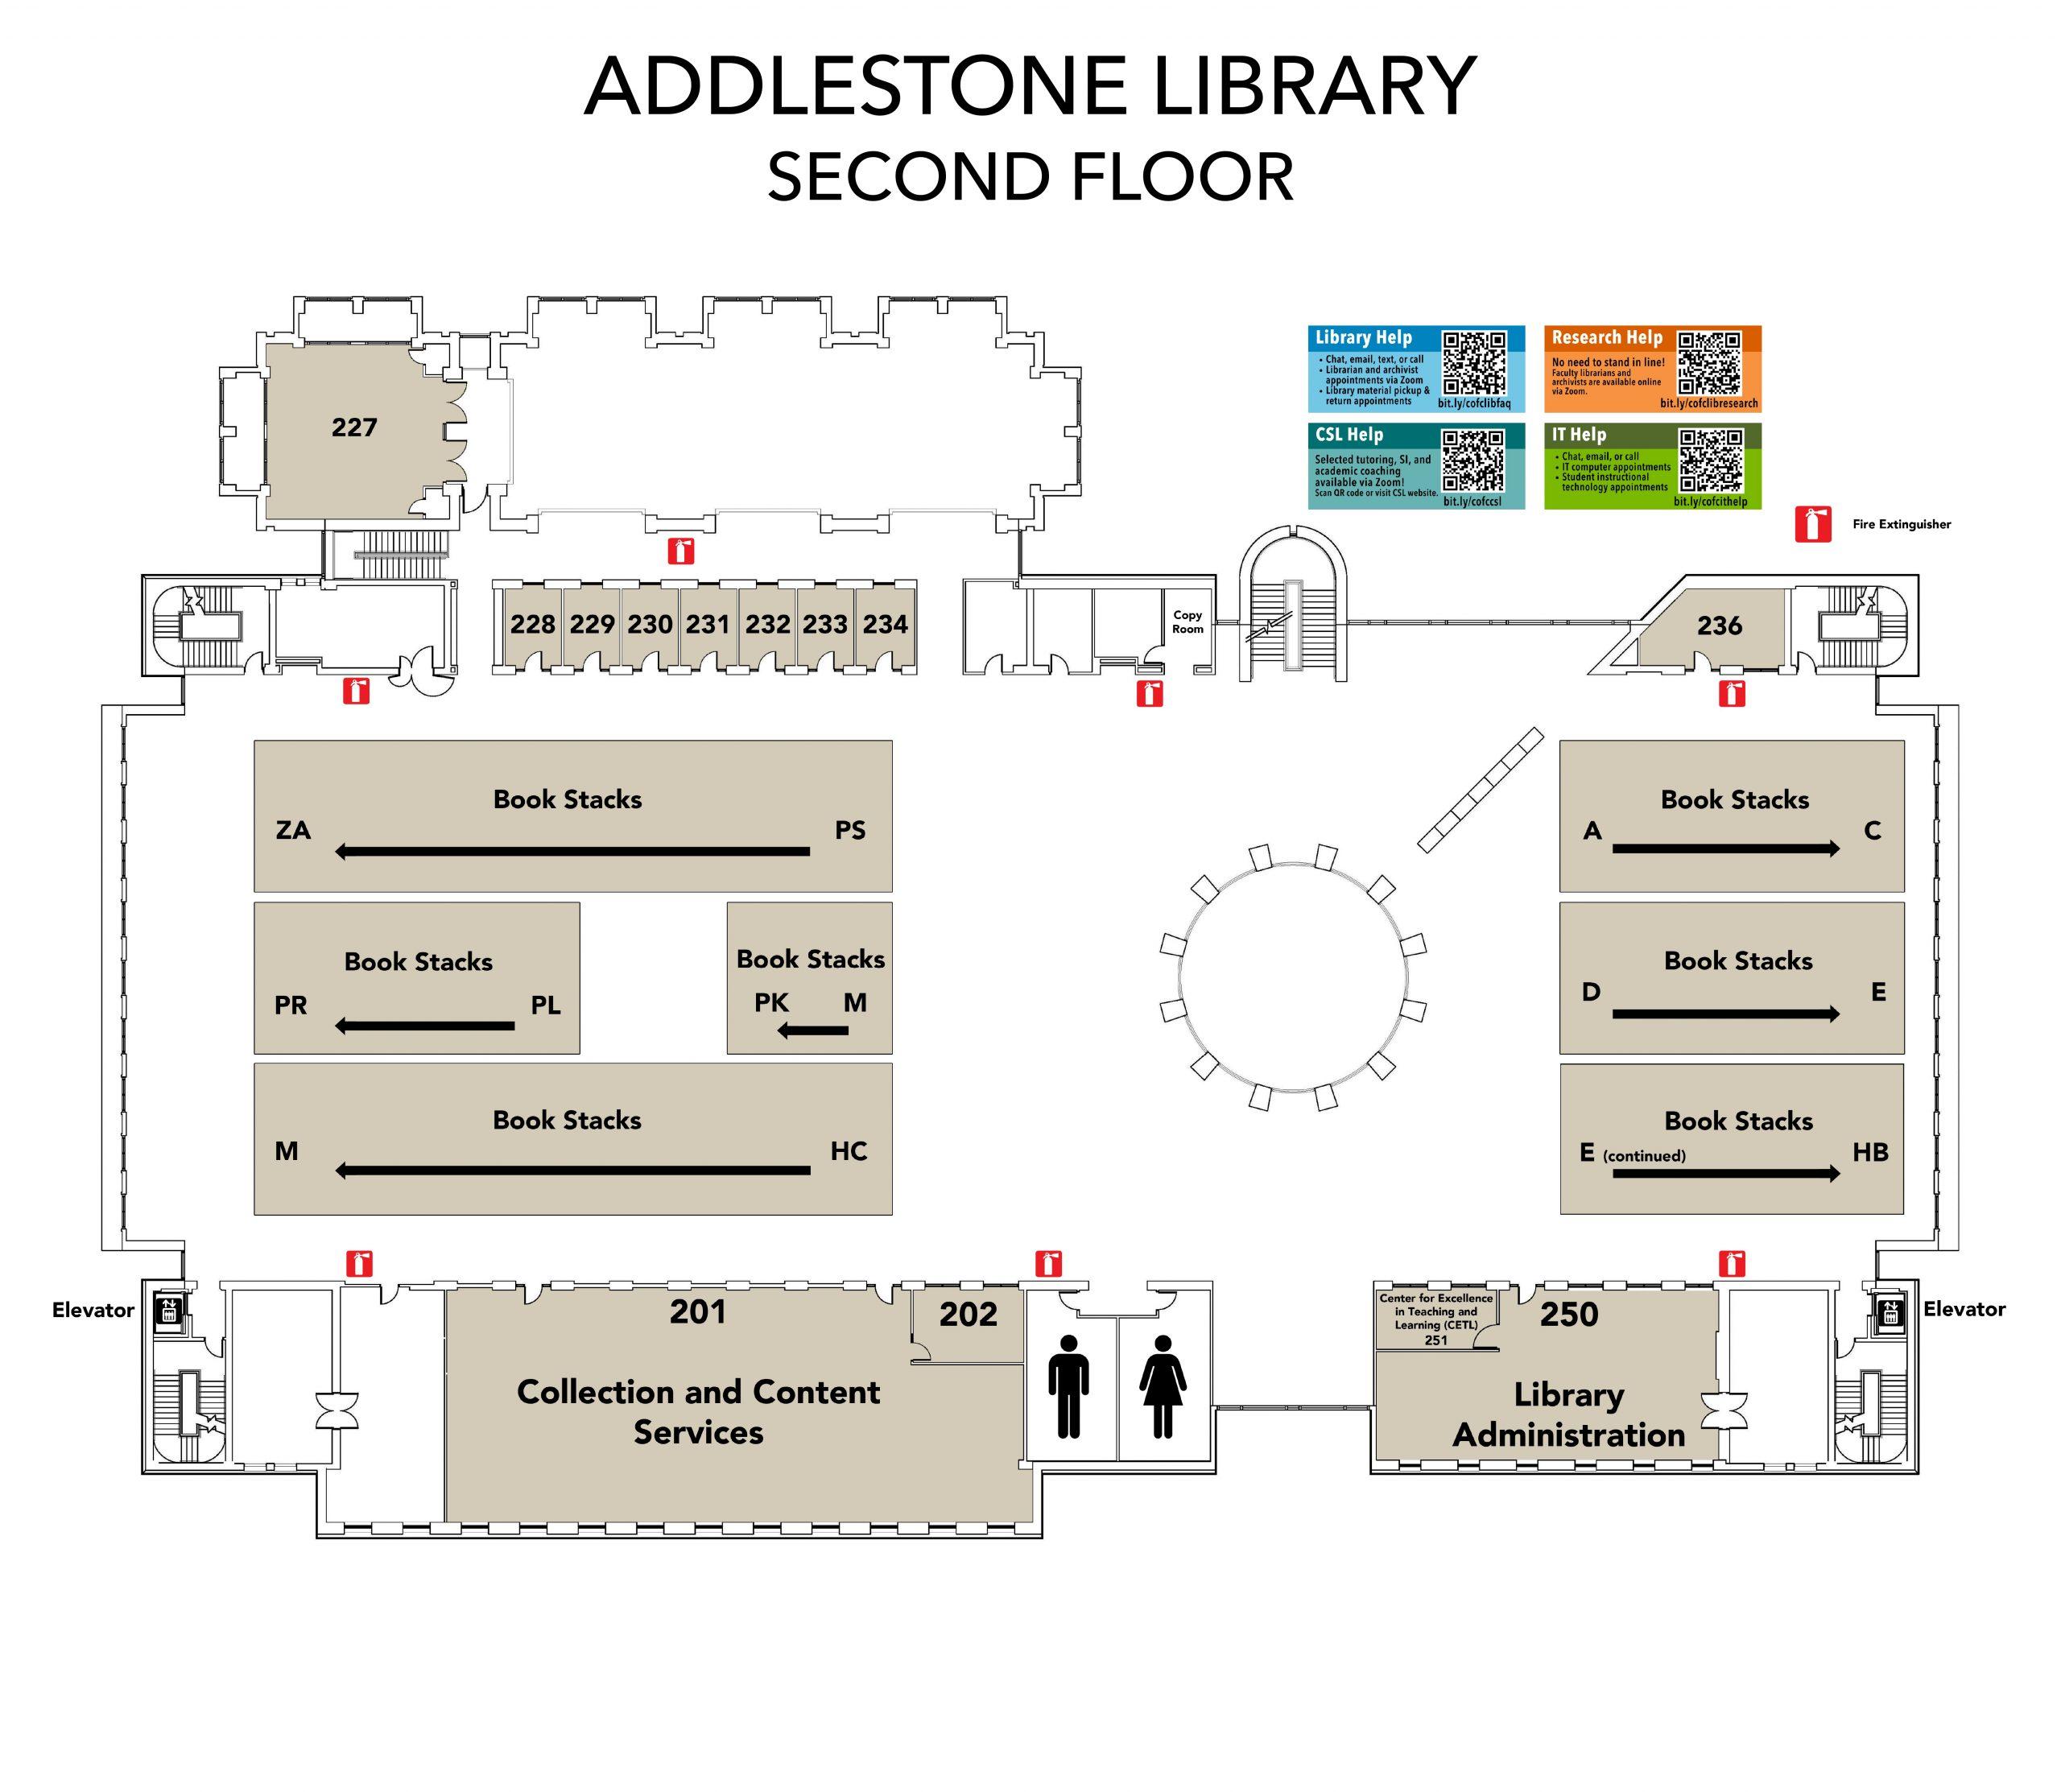 Addlestone Library Floorplans Level 2